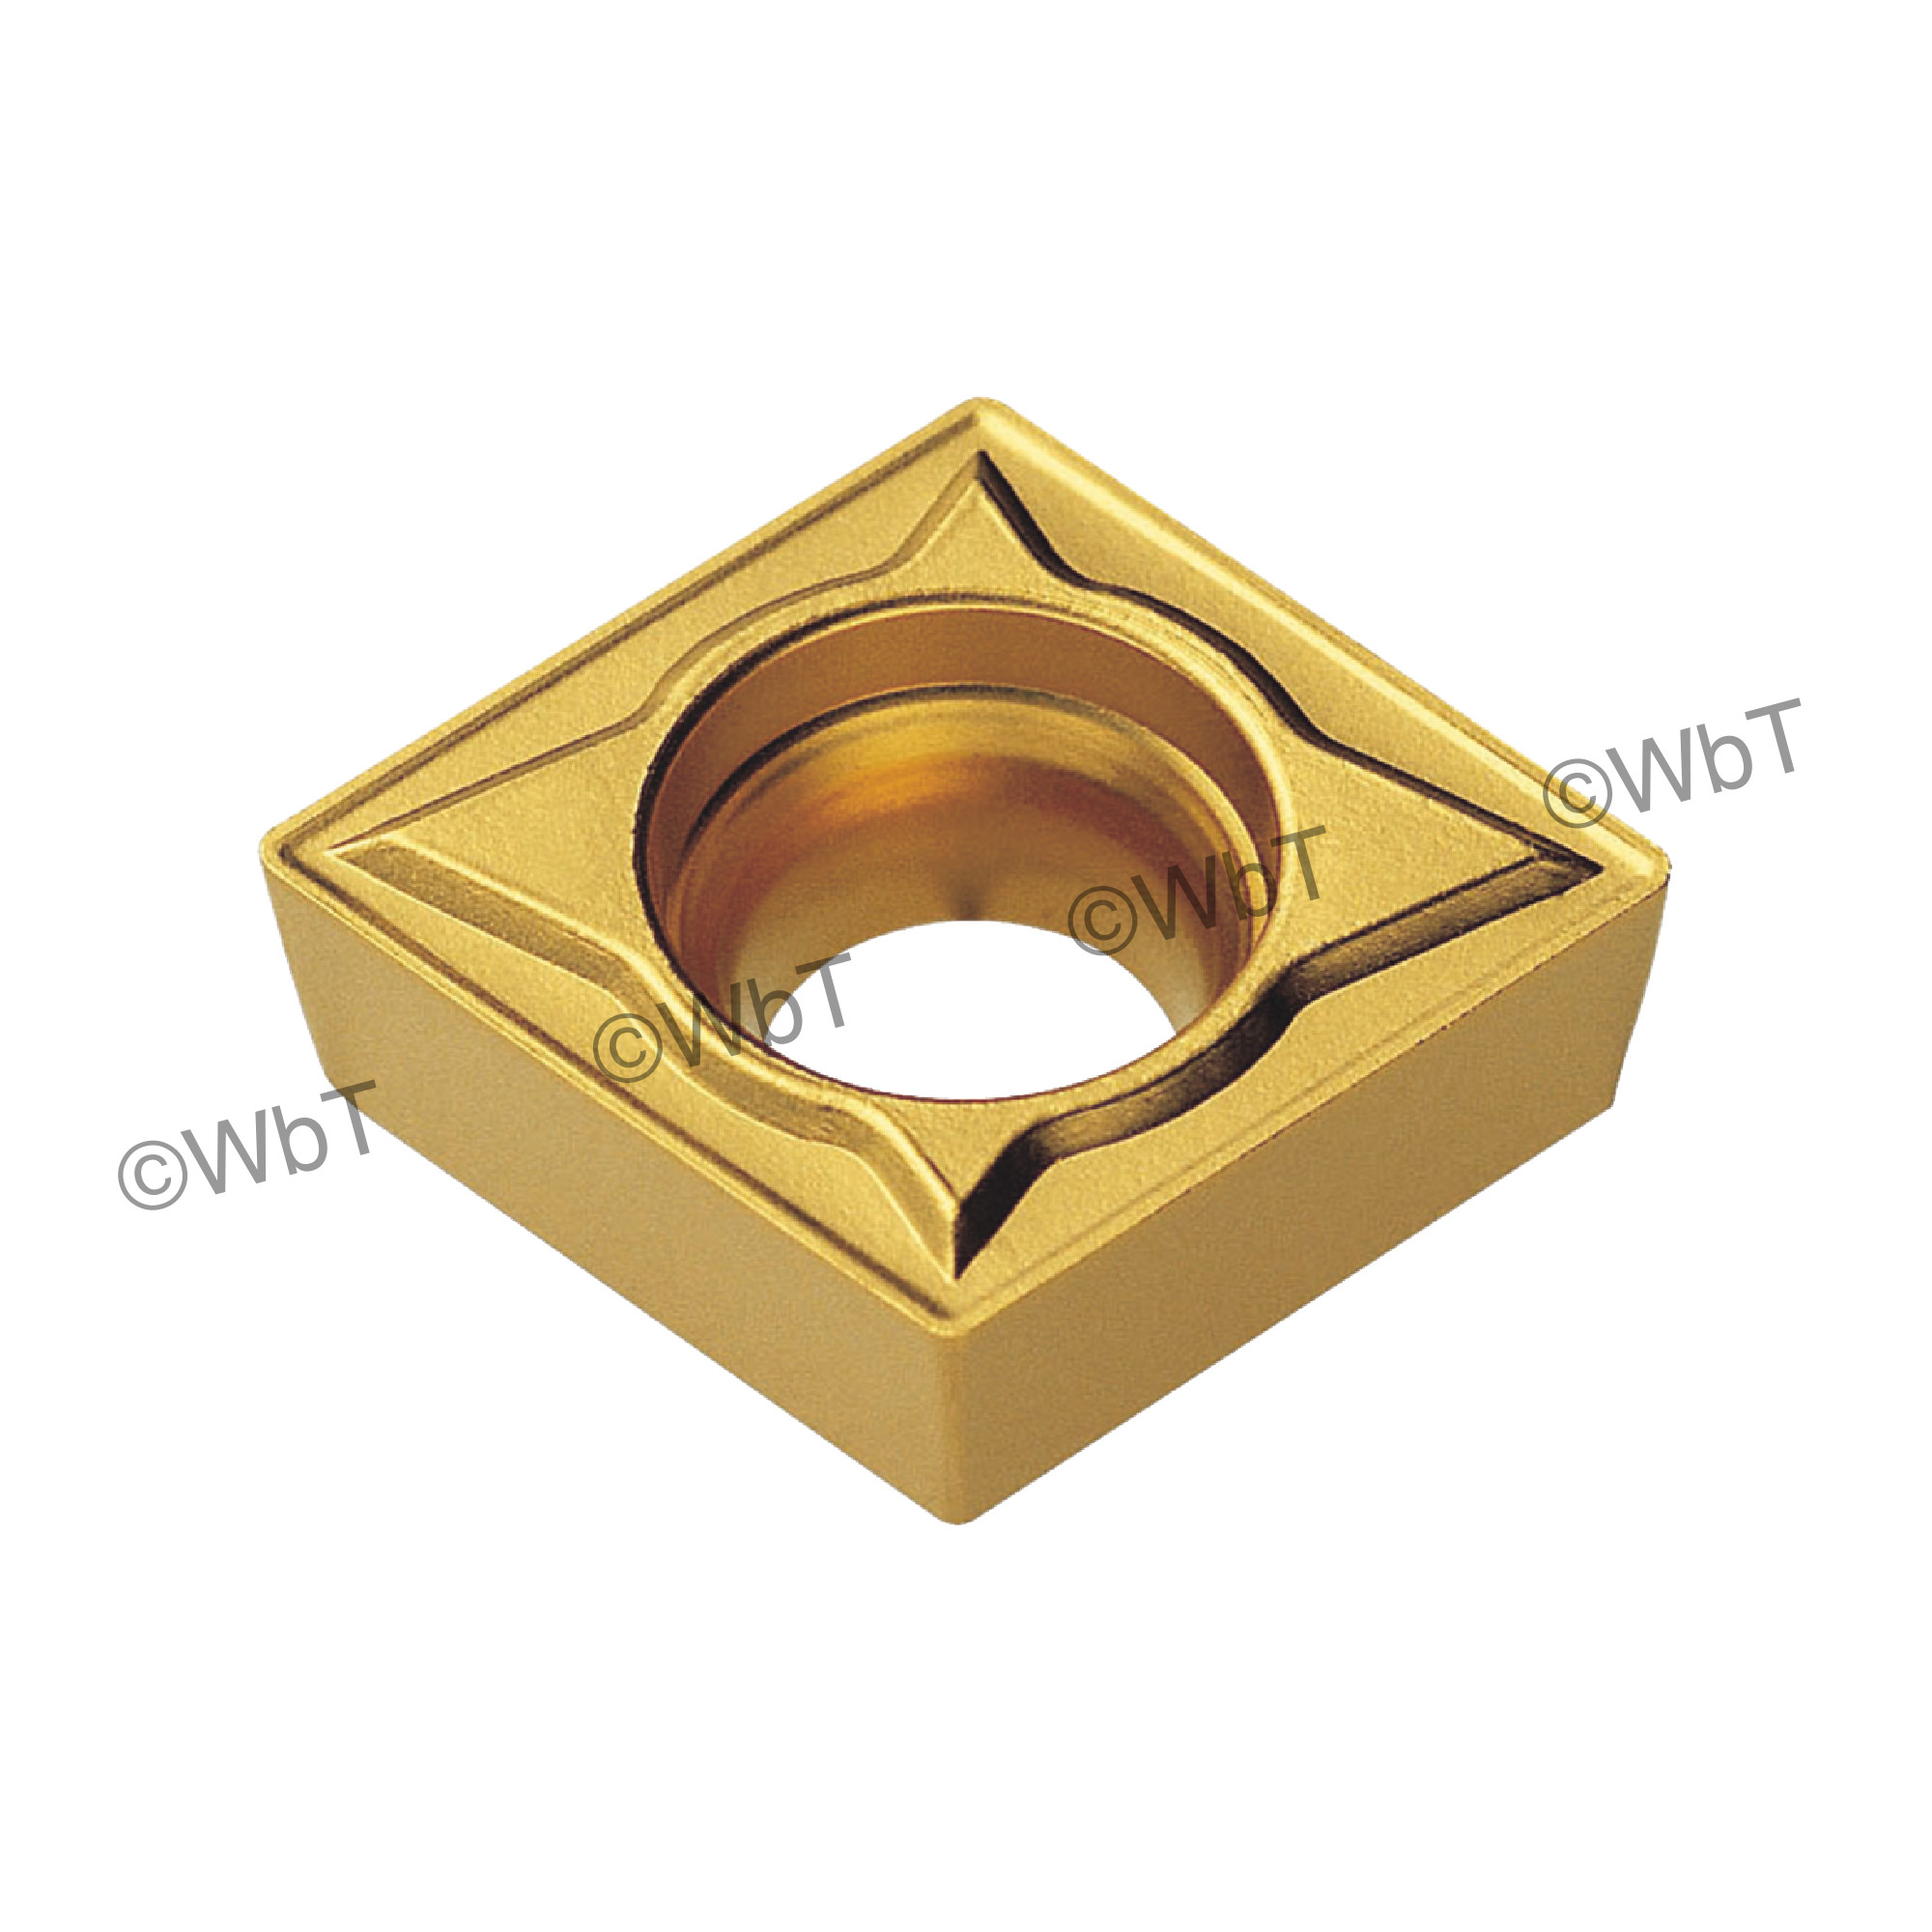 AKUMA - CCMT2(1.5)2-MP1 CT25M - 80° Diamond / Indexable Carbide Turning Insert